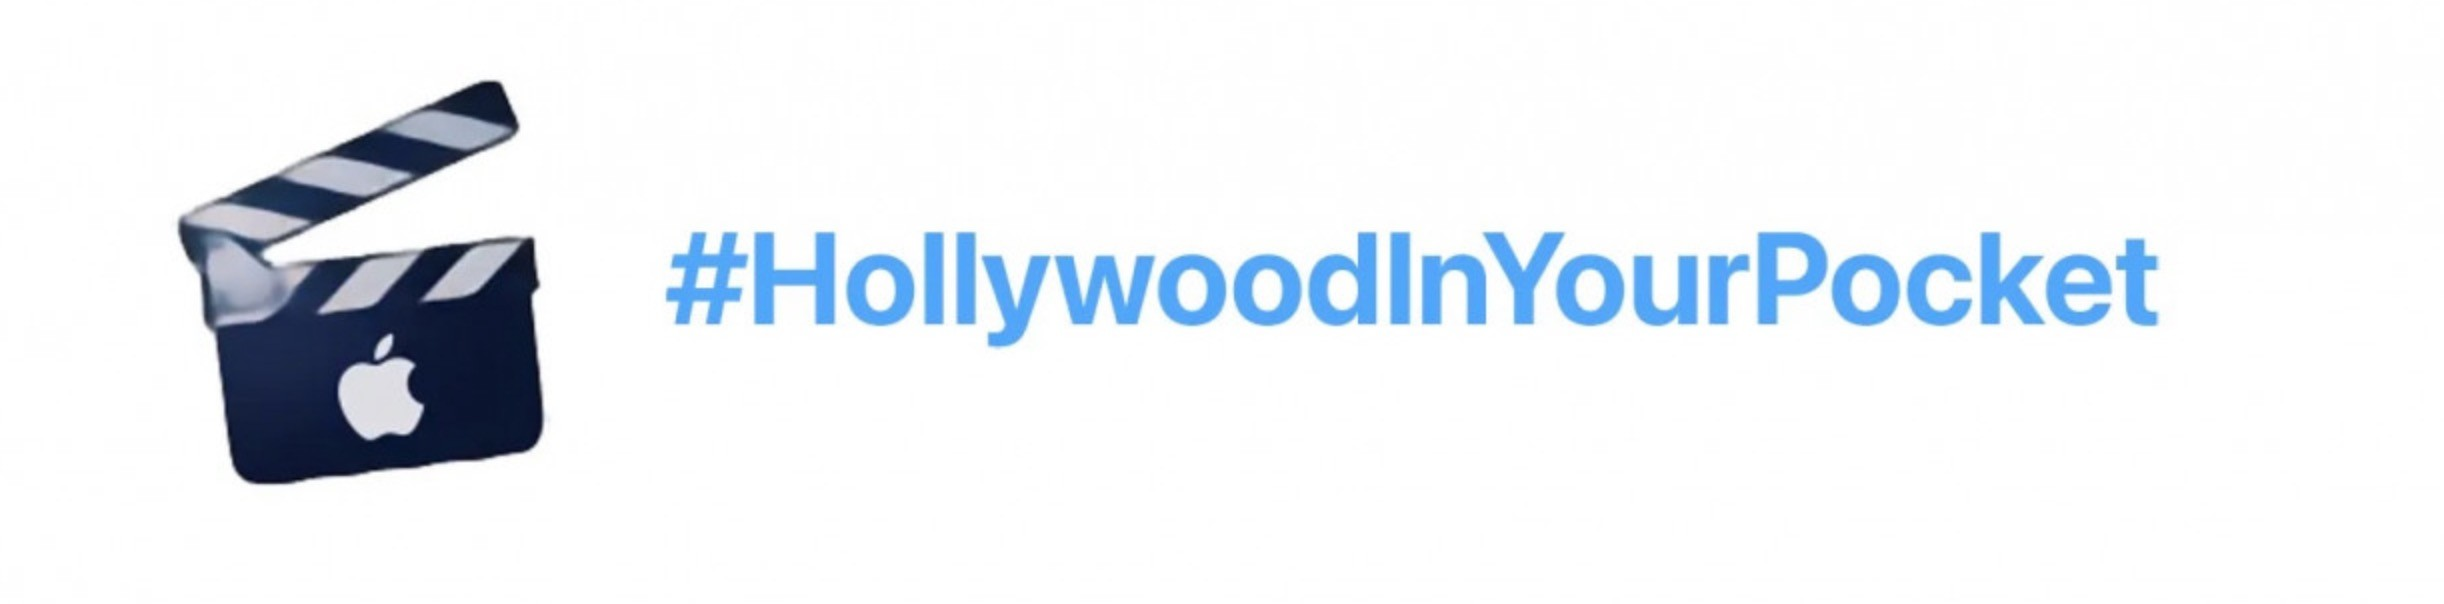 #HollywoodInYourPocket – Apple uruchamia nowy hashtag na Twitterze ciekawostki Twitter, HollywoodInYourPocket, hastag  Twitter ma nowy hashtag Apple #HollywoodInYourPocket z klapsem, który jest wykorzystywany w profesjonalnej kinematografii. Jest to element kampanii iPhone 13 i iPhone 13 Pro. hastag